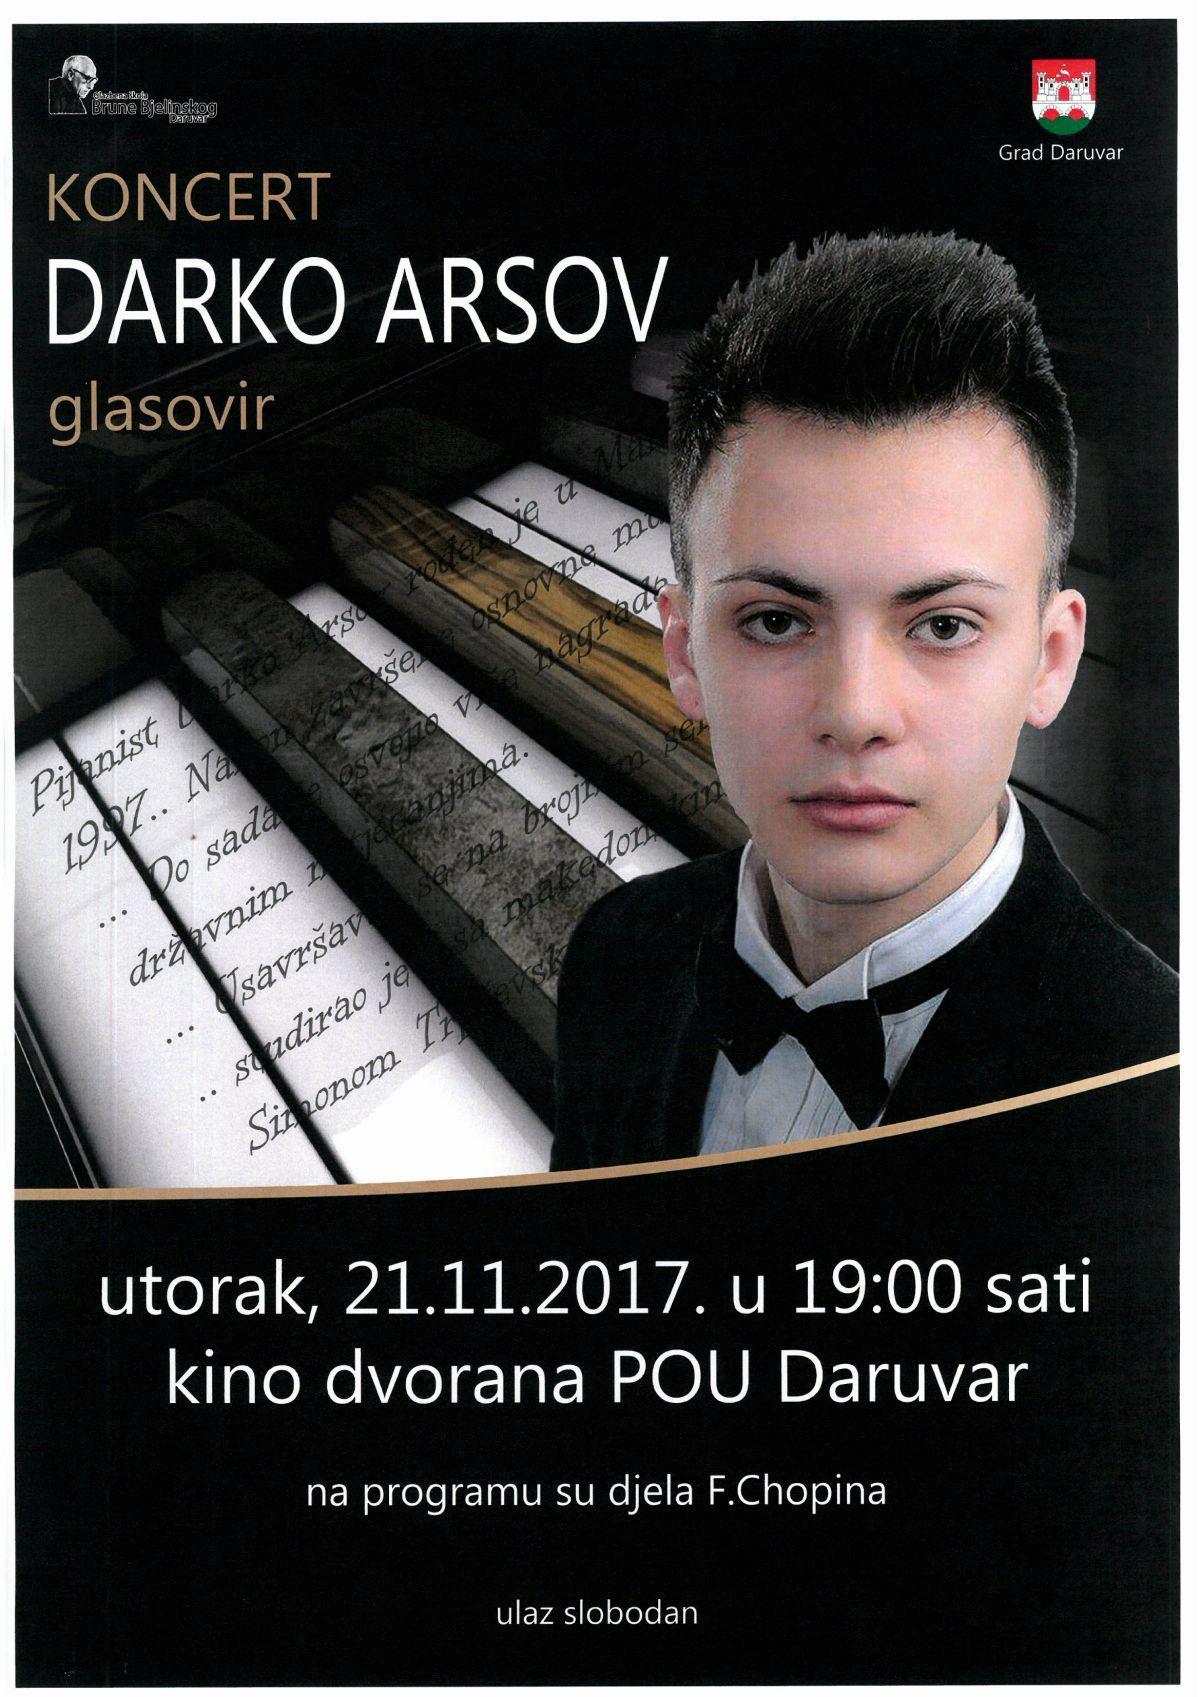 Darko Arsov